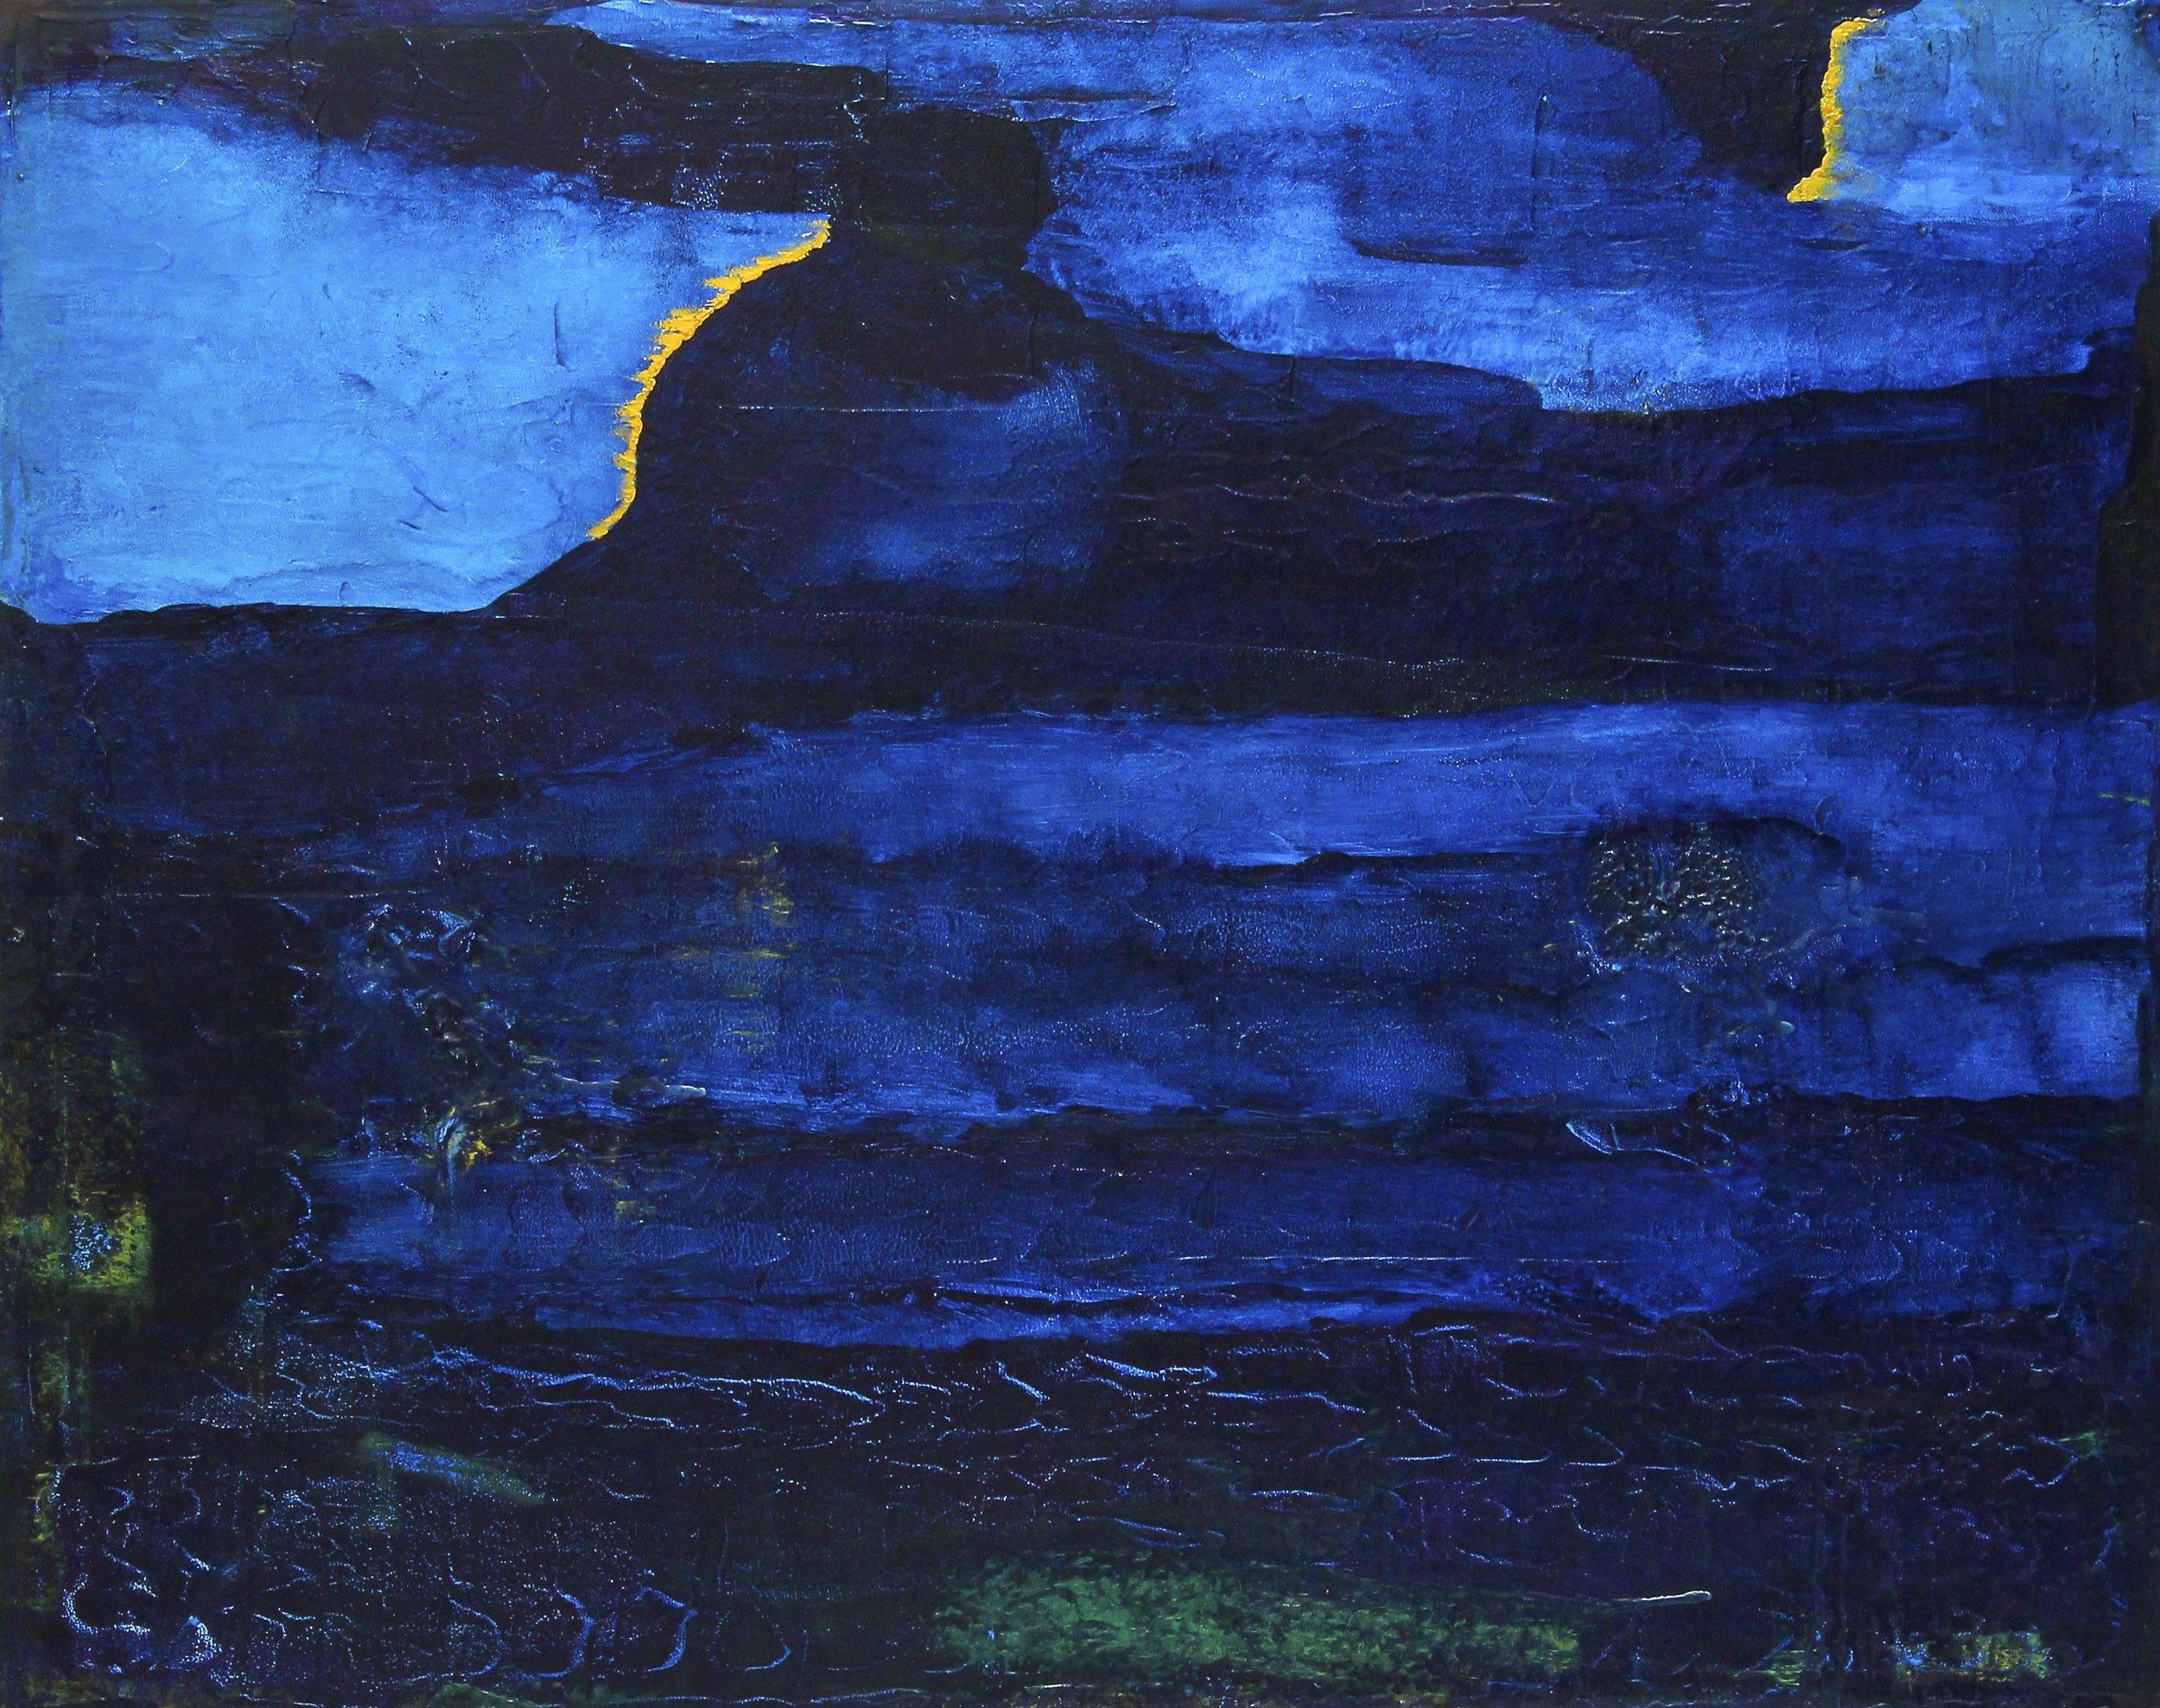 14_08 - grotta azzura 1.jpg